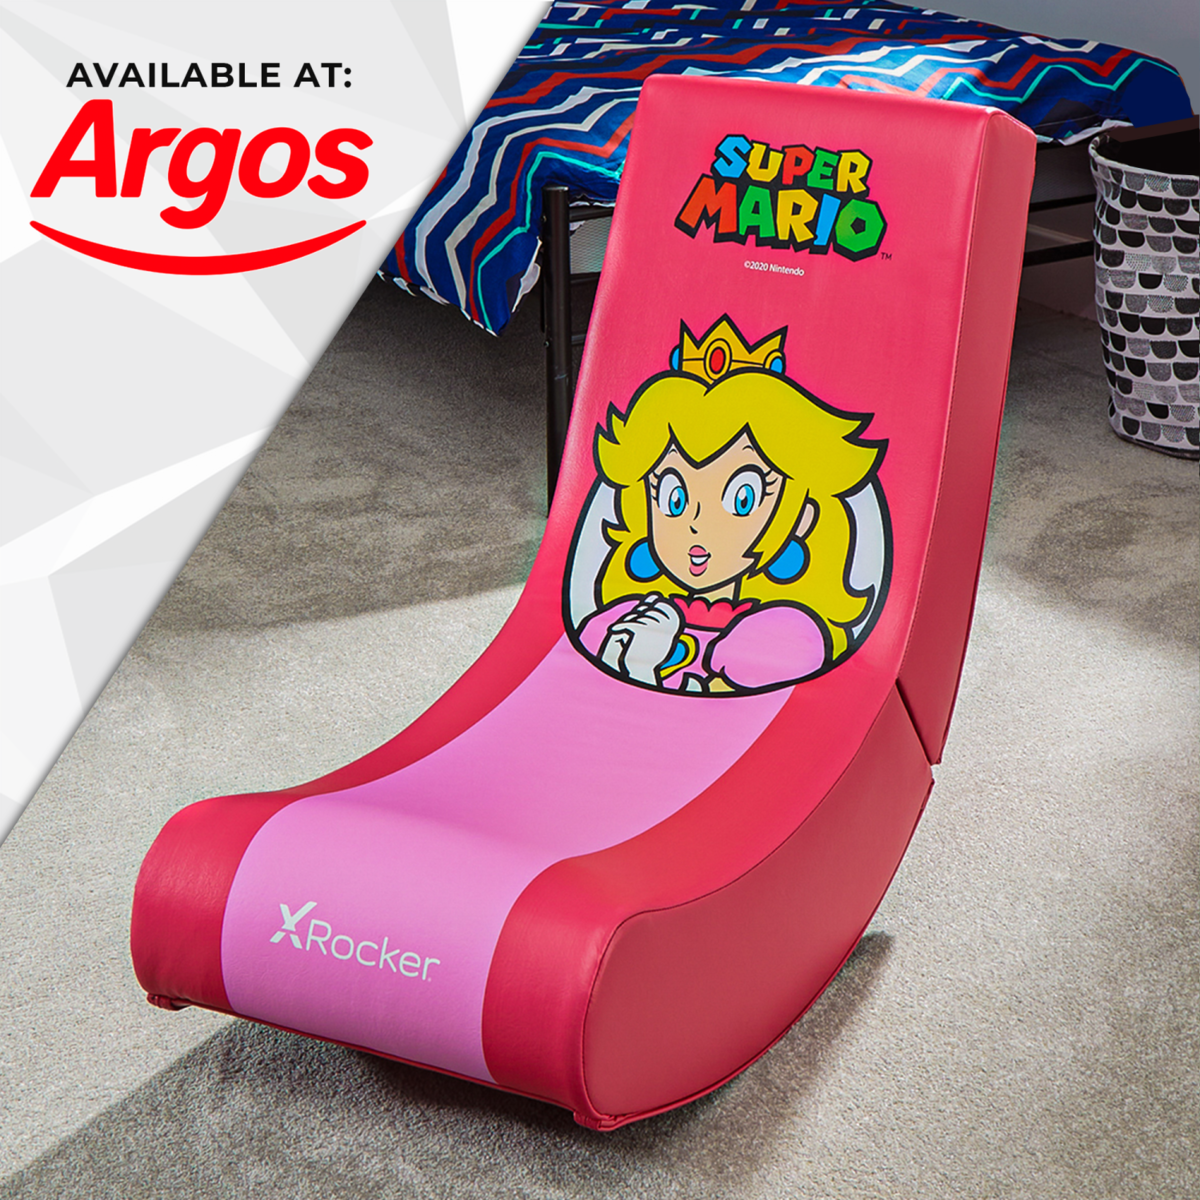 Nintendo Super Mario X Rocker Gaming Chair Floor Rocker Princess Peach Spotlight Edition available at Argos